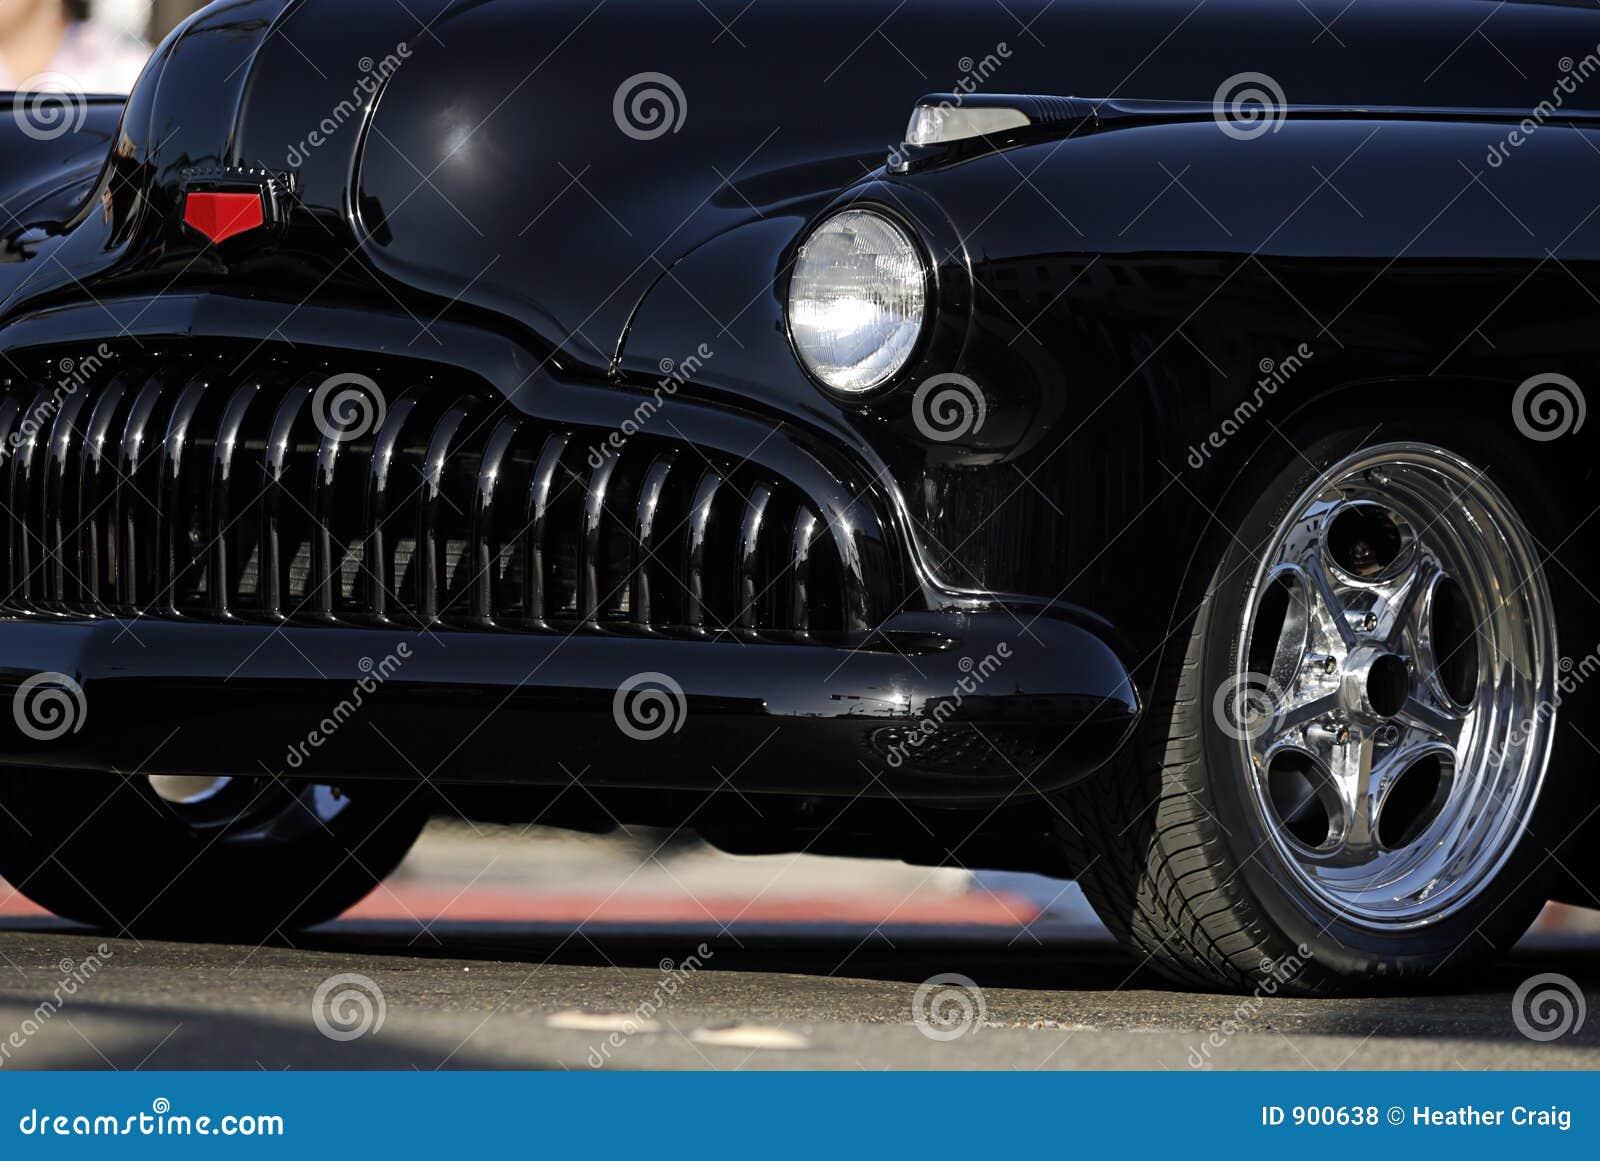 Classic Vintage Car: Black Grill Stock Photo - Image: 900638